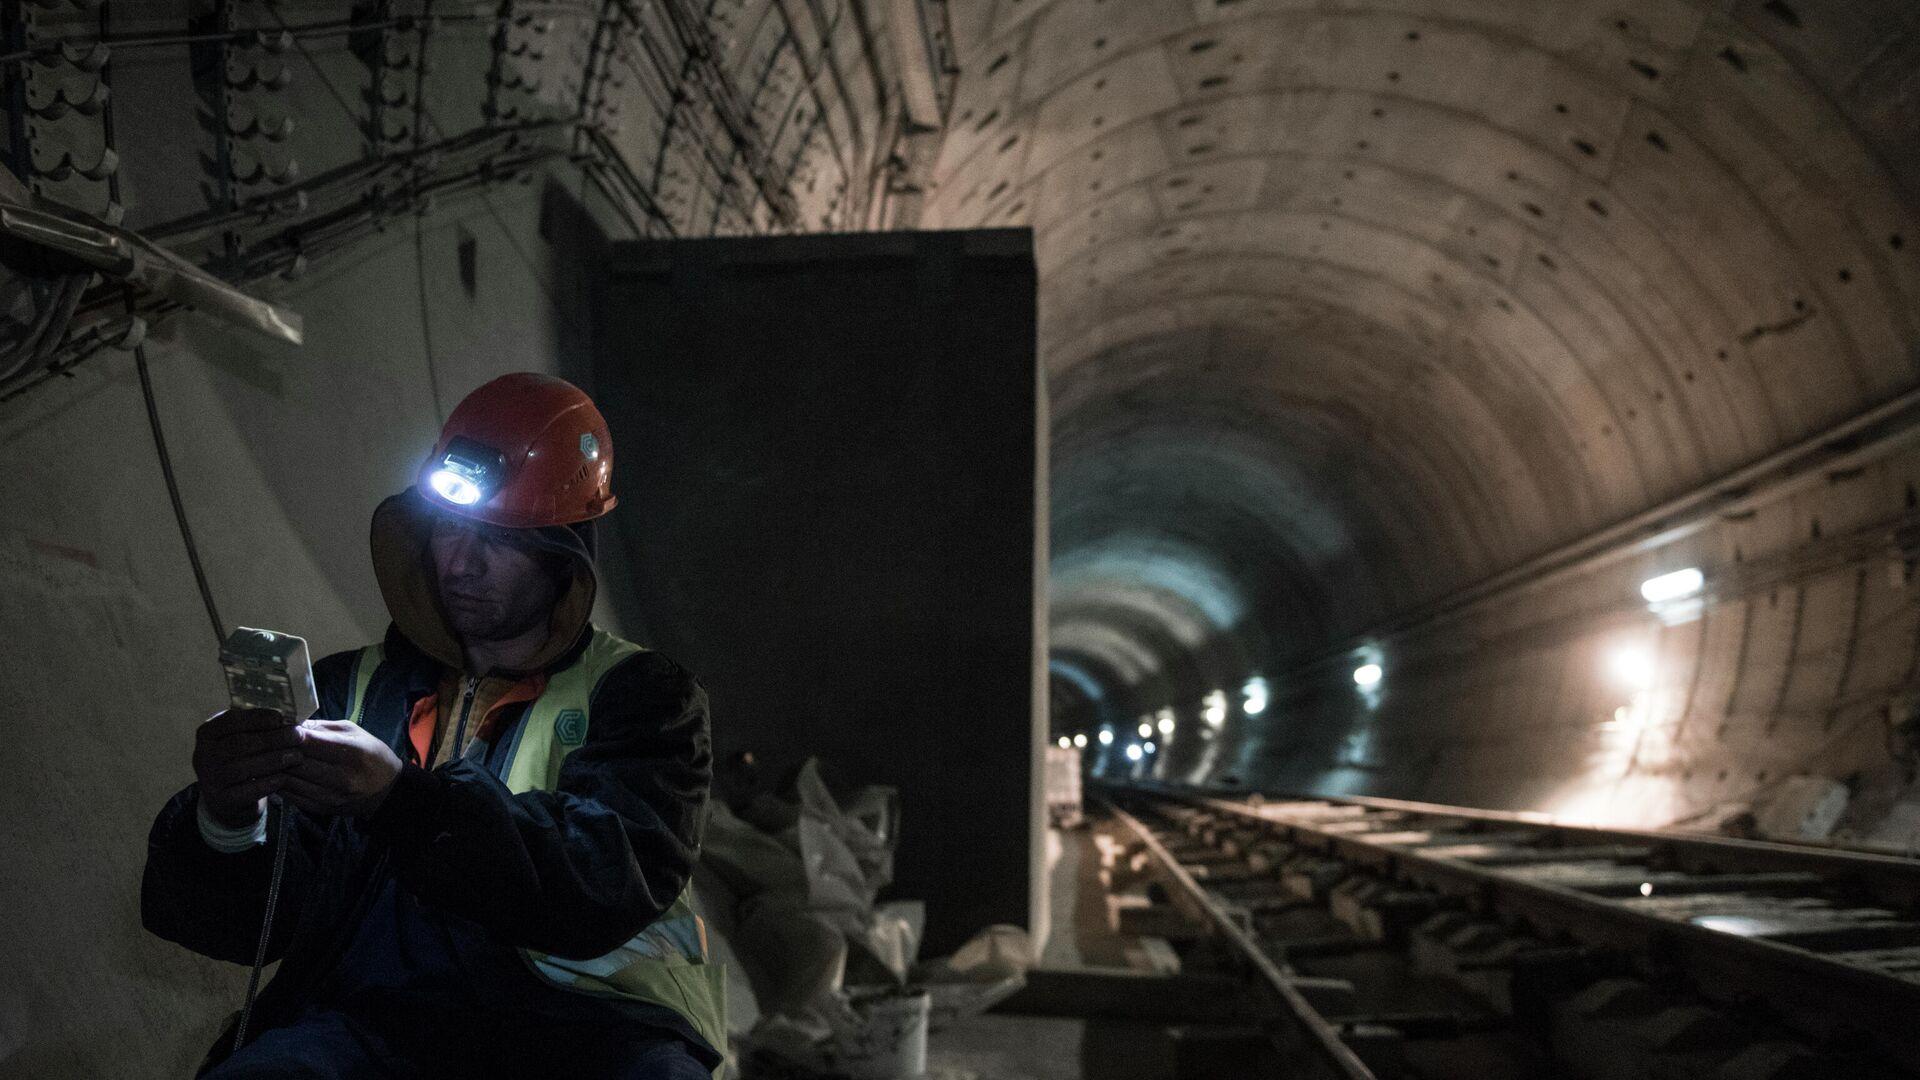 Строительство тоннеля на БАМ - РИА Новости, 1920, 17.09.2020